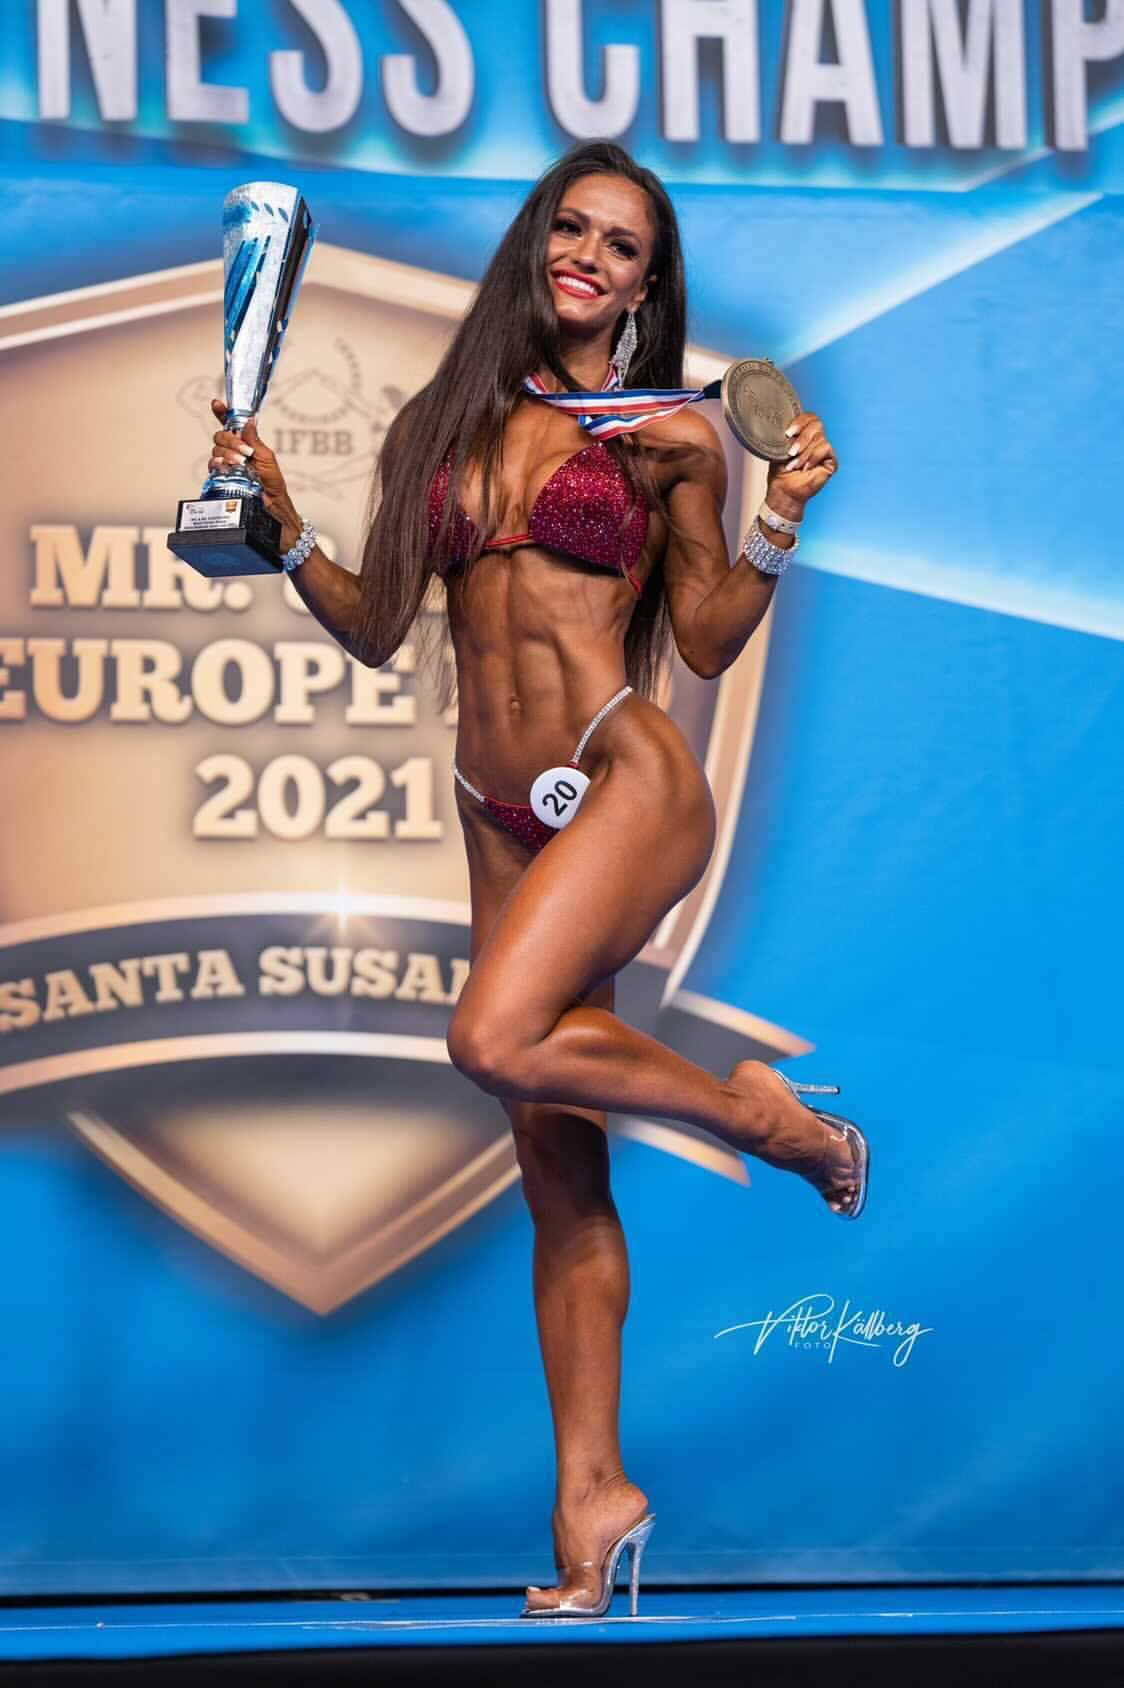 Yana Kuznetsova vince il miss europe 2021 ifbb elite pro